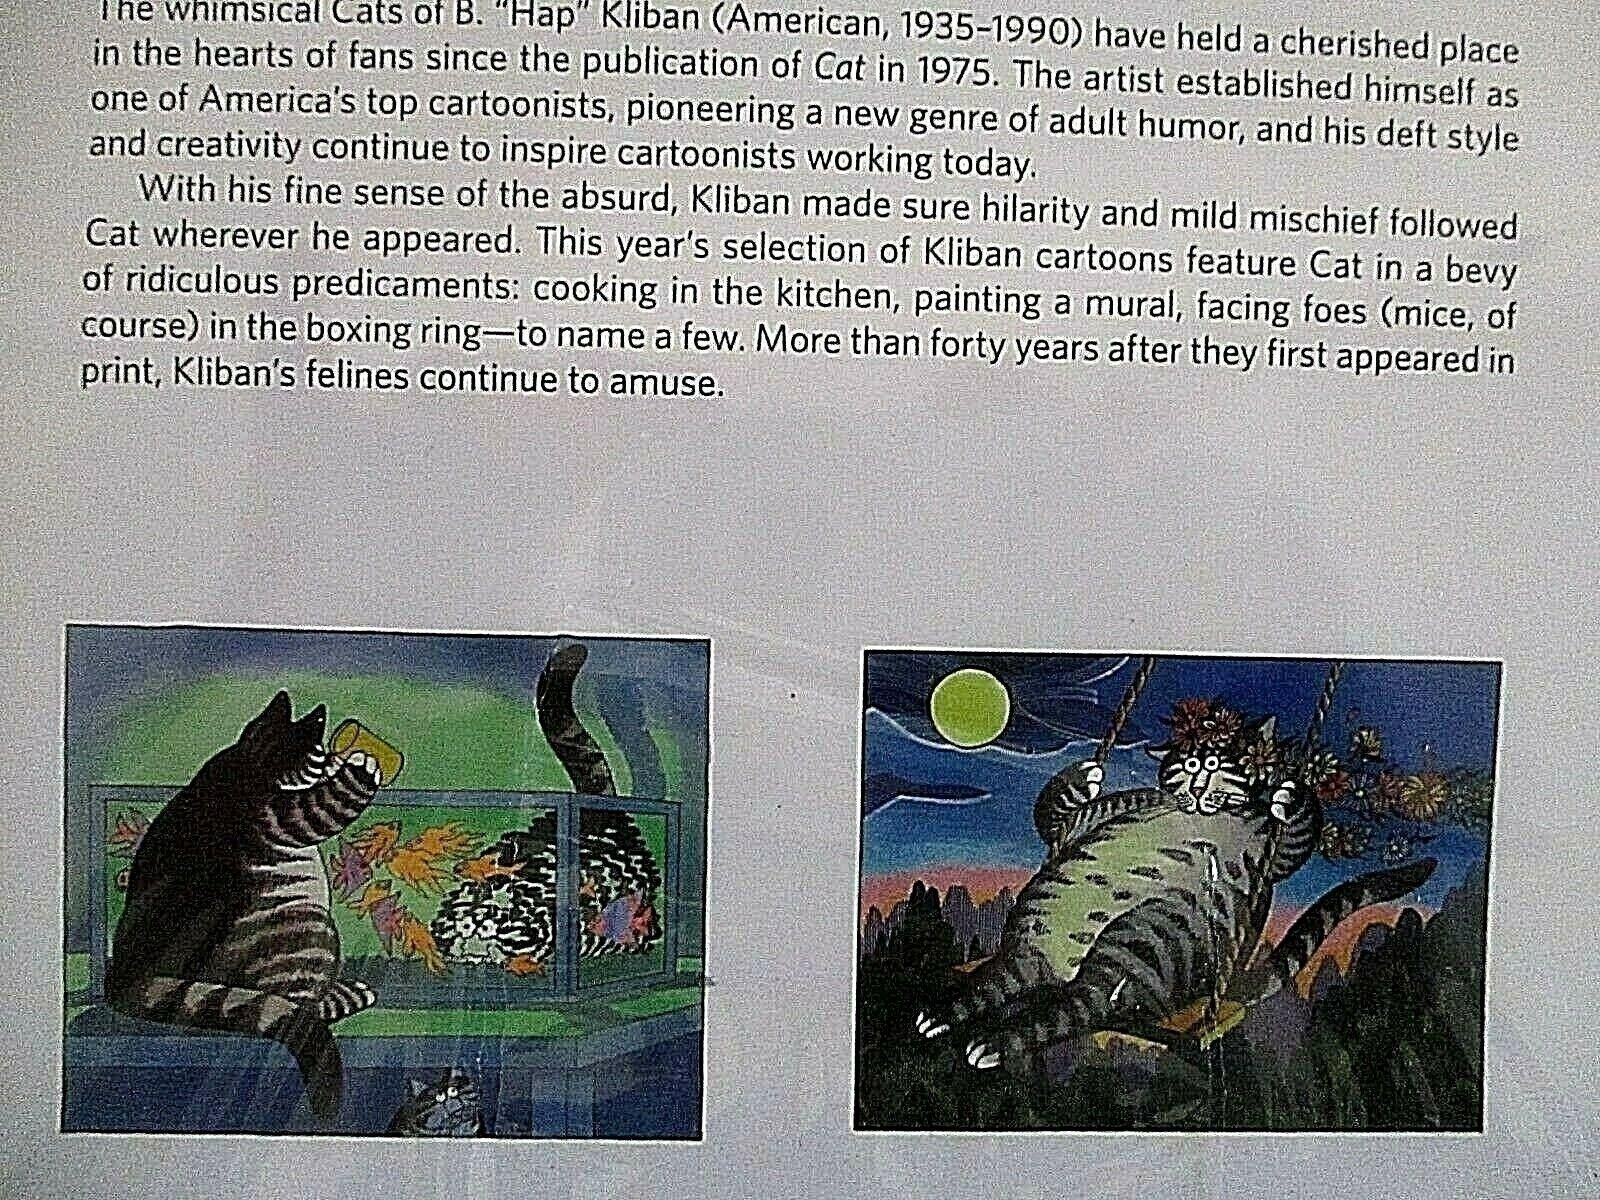 B. Kliban – Catcalendar 2019 Cat Calendar   Ebay B Kliban Cat Calendar 2019